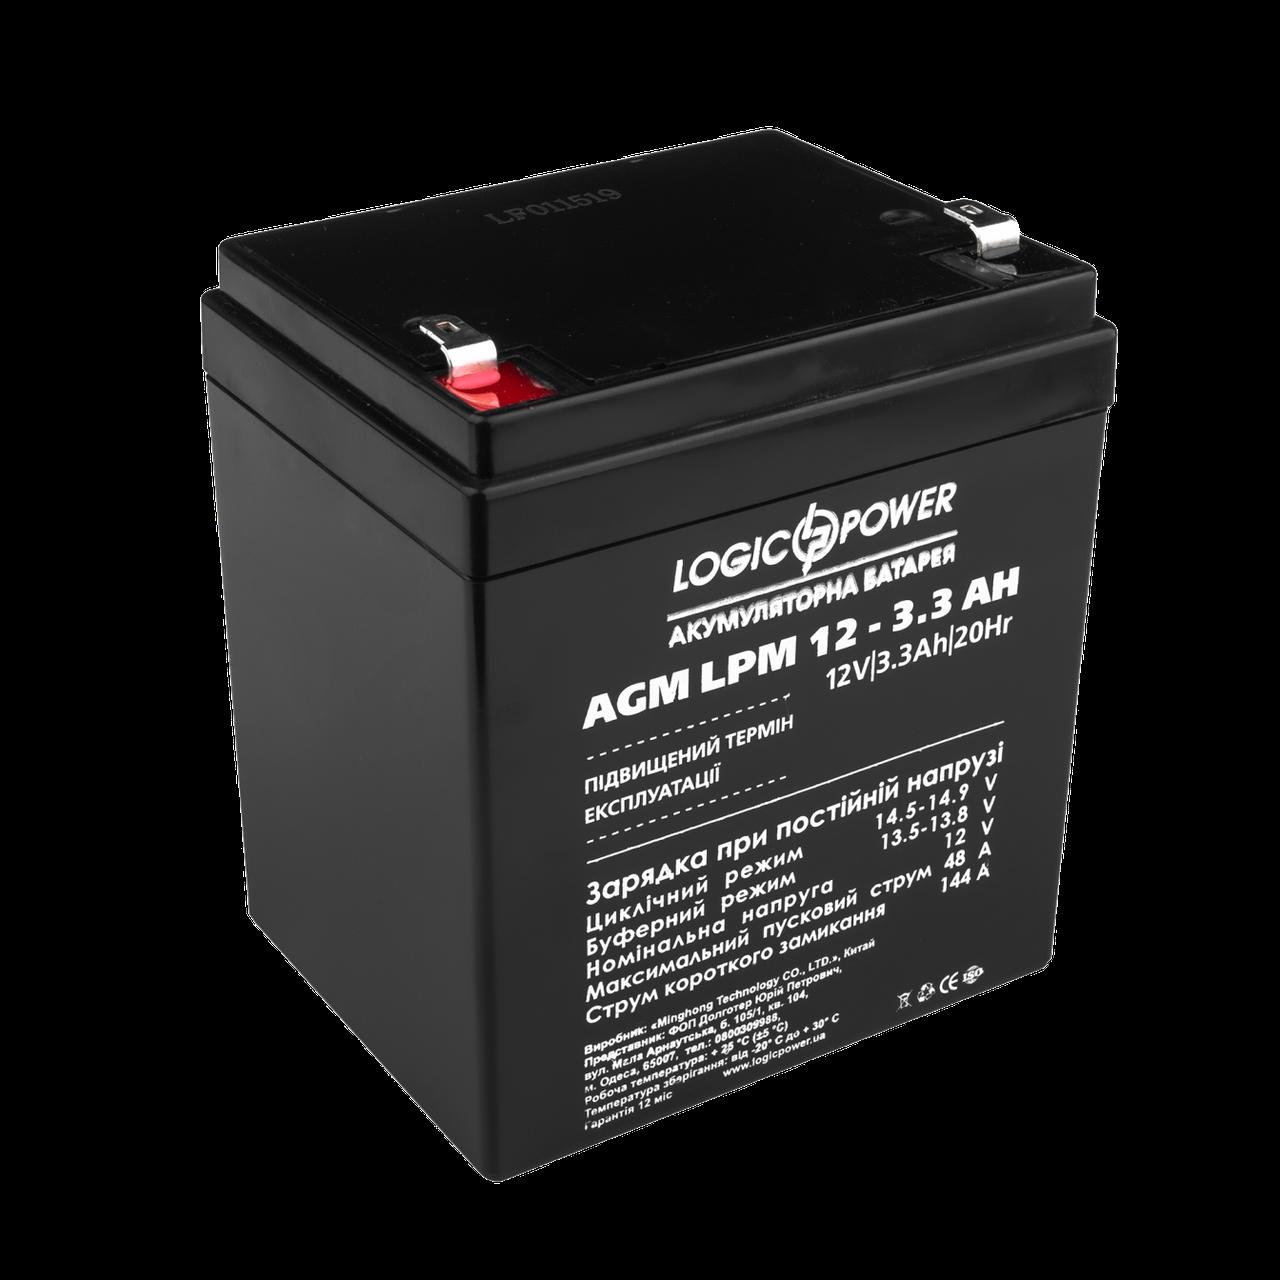 Акумулятор AGM LogicPower LPM 12 - 3,3 AH